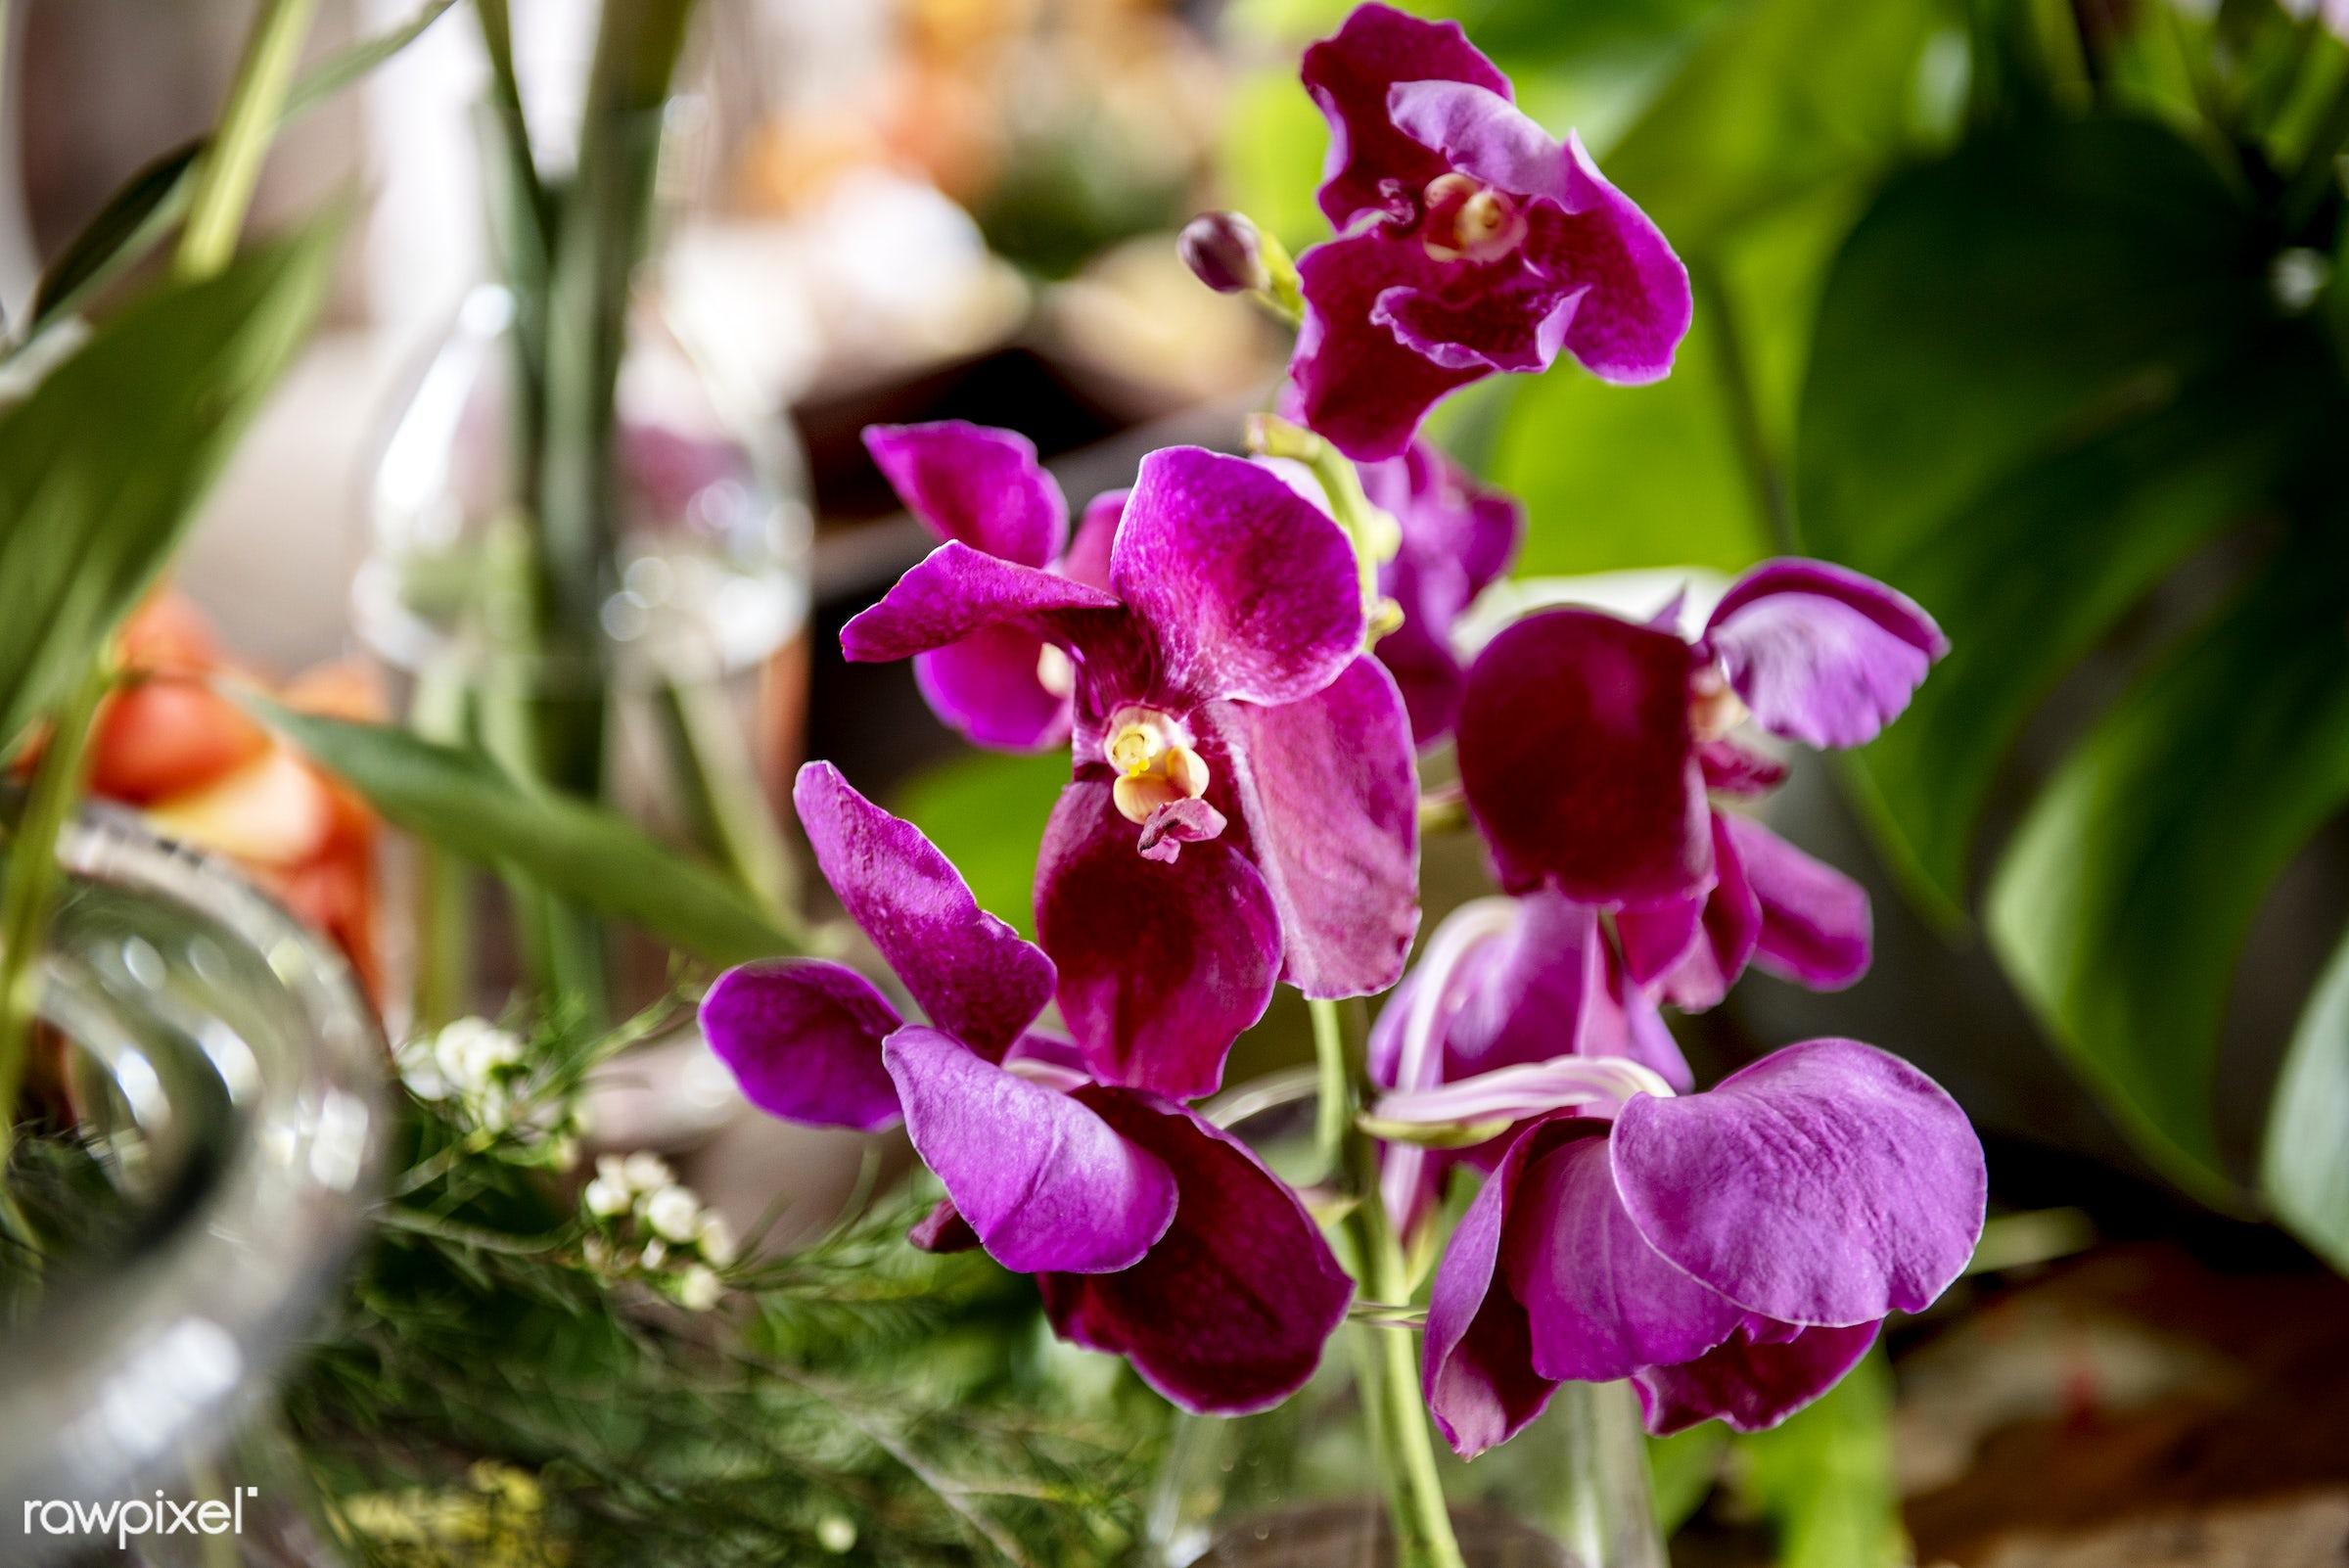 plant, decoration, flora, refreshment, leisure, florist, recreational, fresh, natural, flower